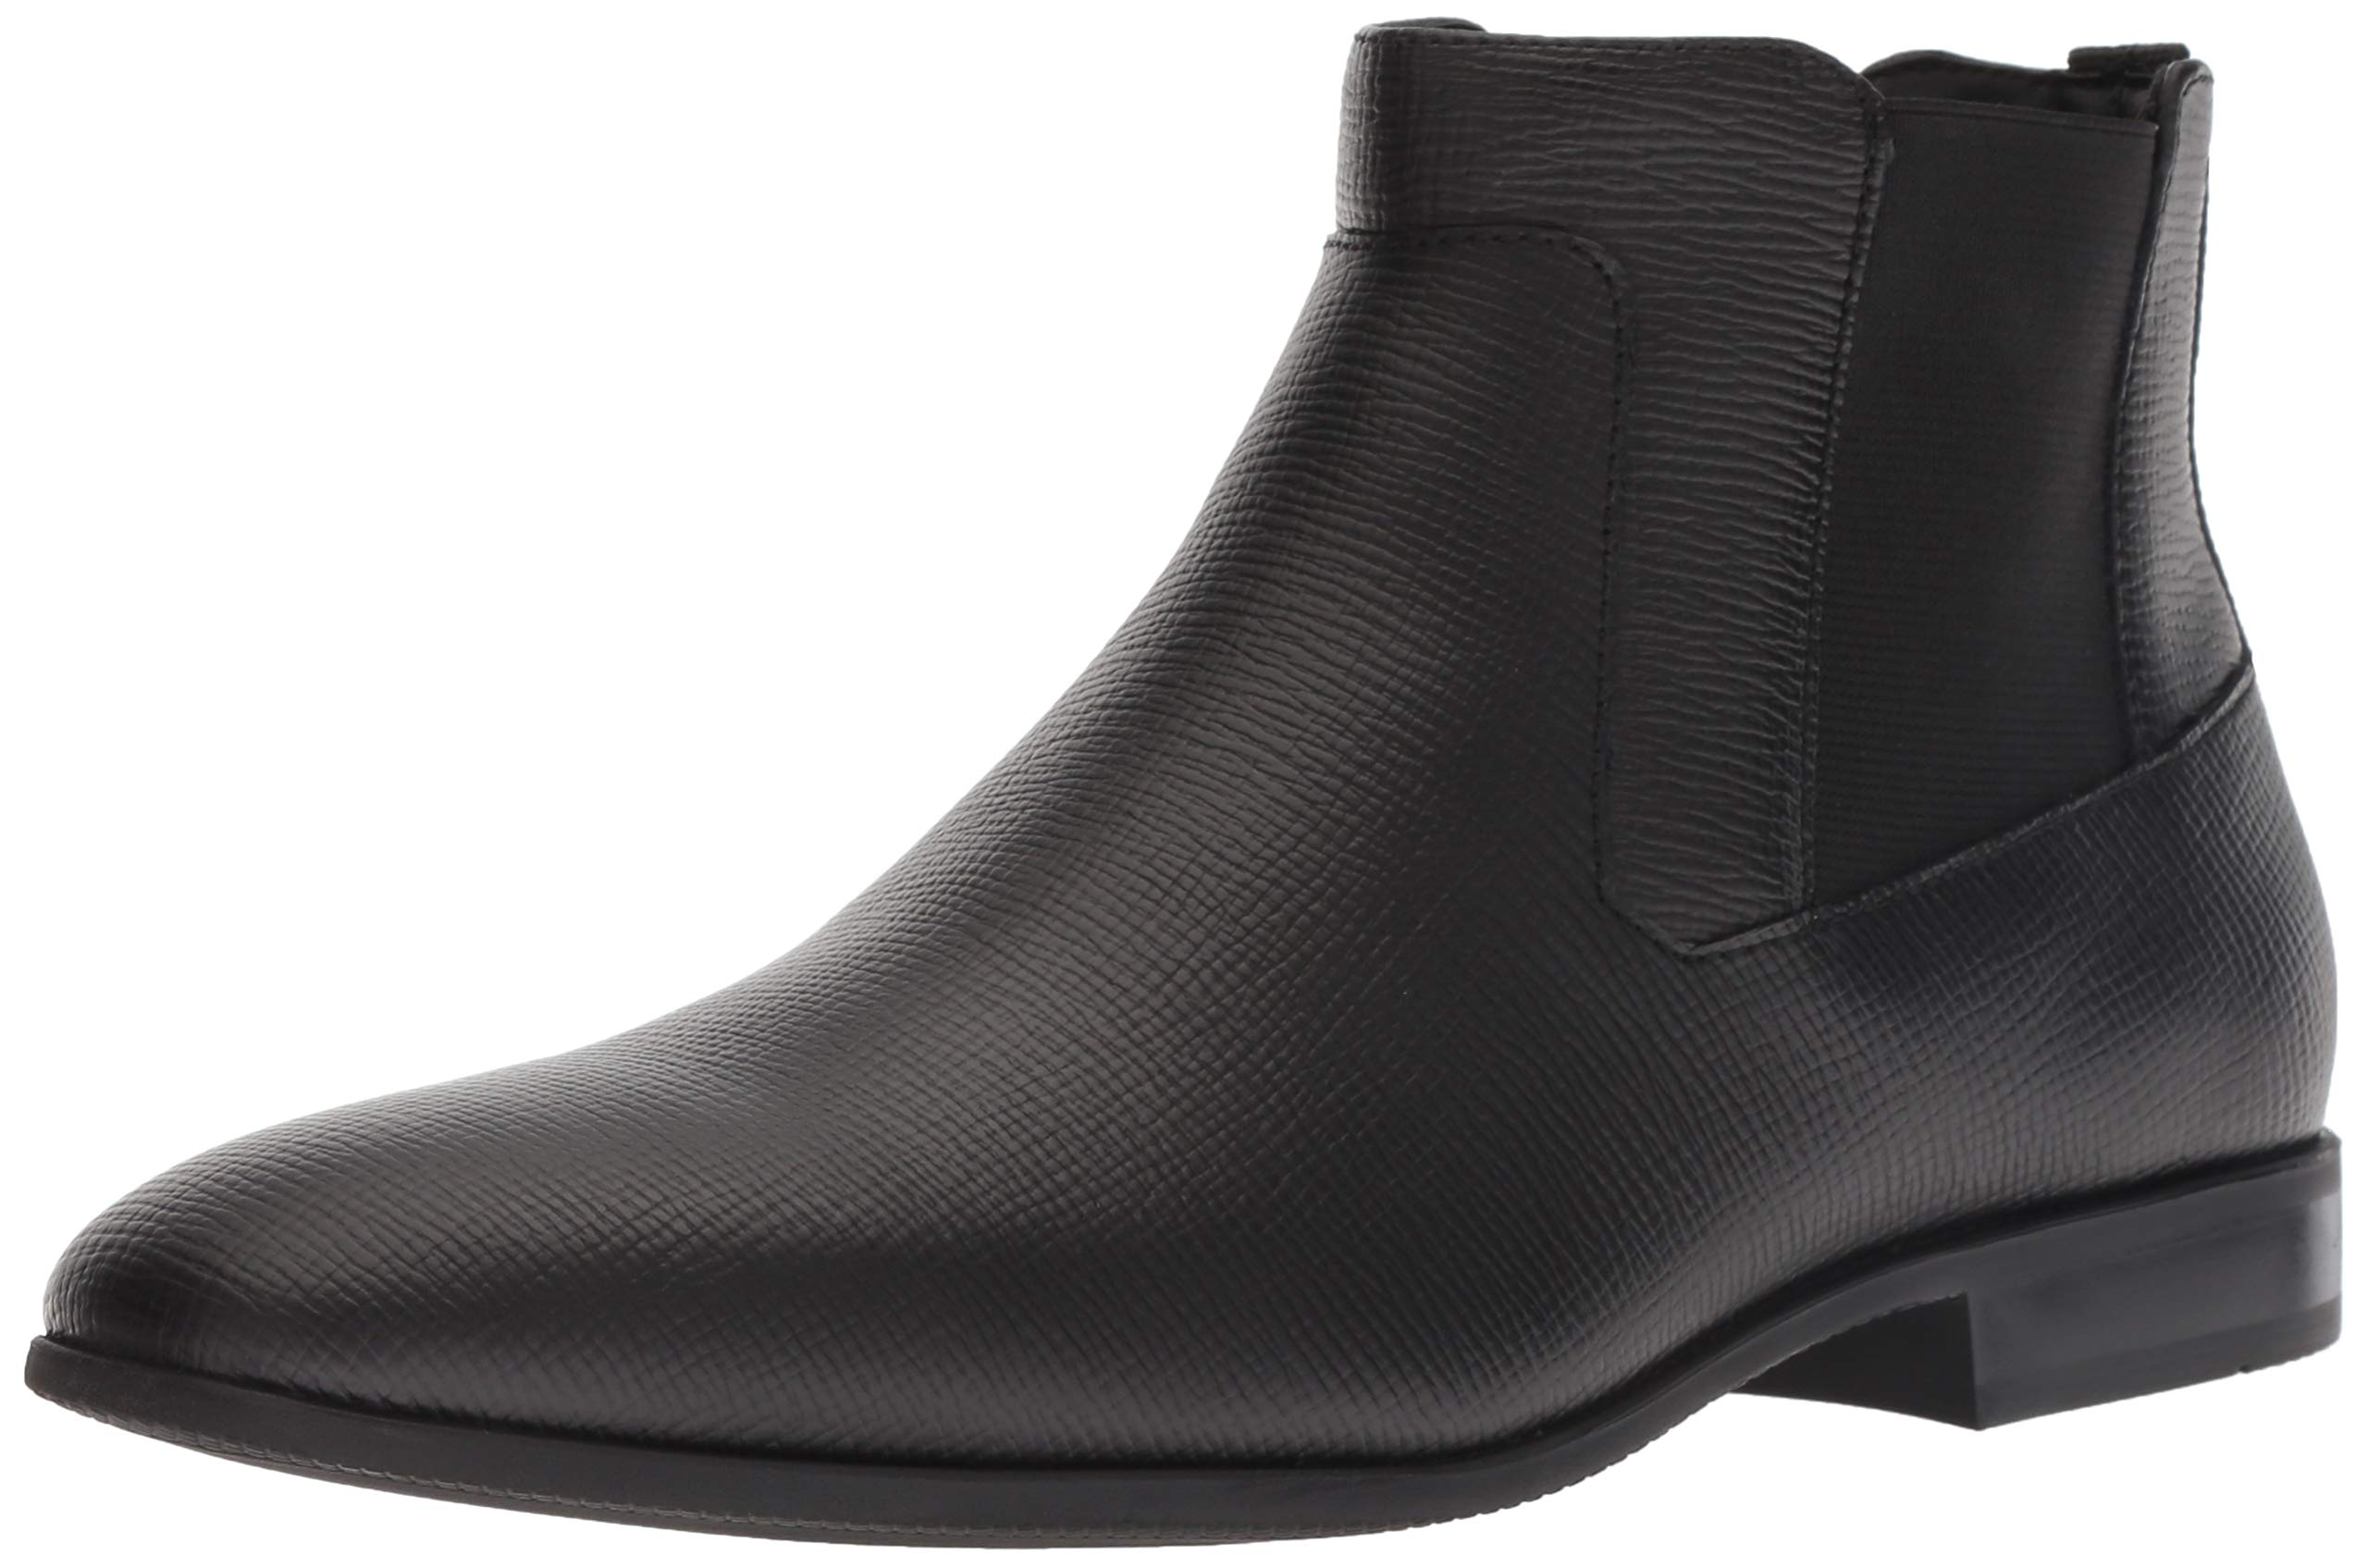 Calvin Klein Men's CHRISTOFF EPI Leather Chelsea Boot, Black, 9.5 M M US